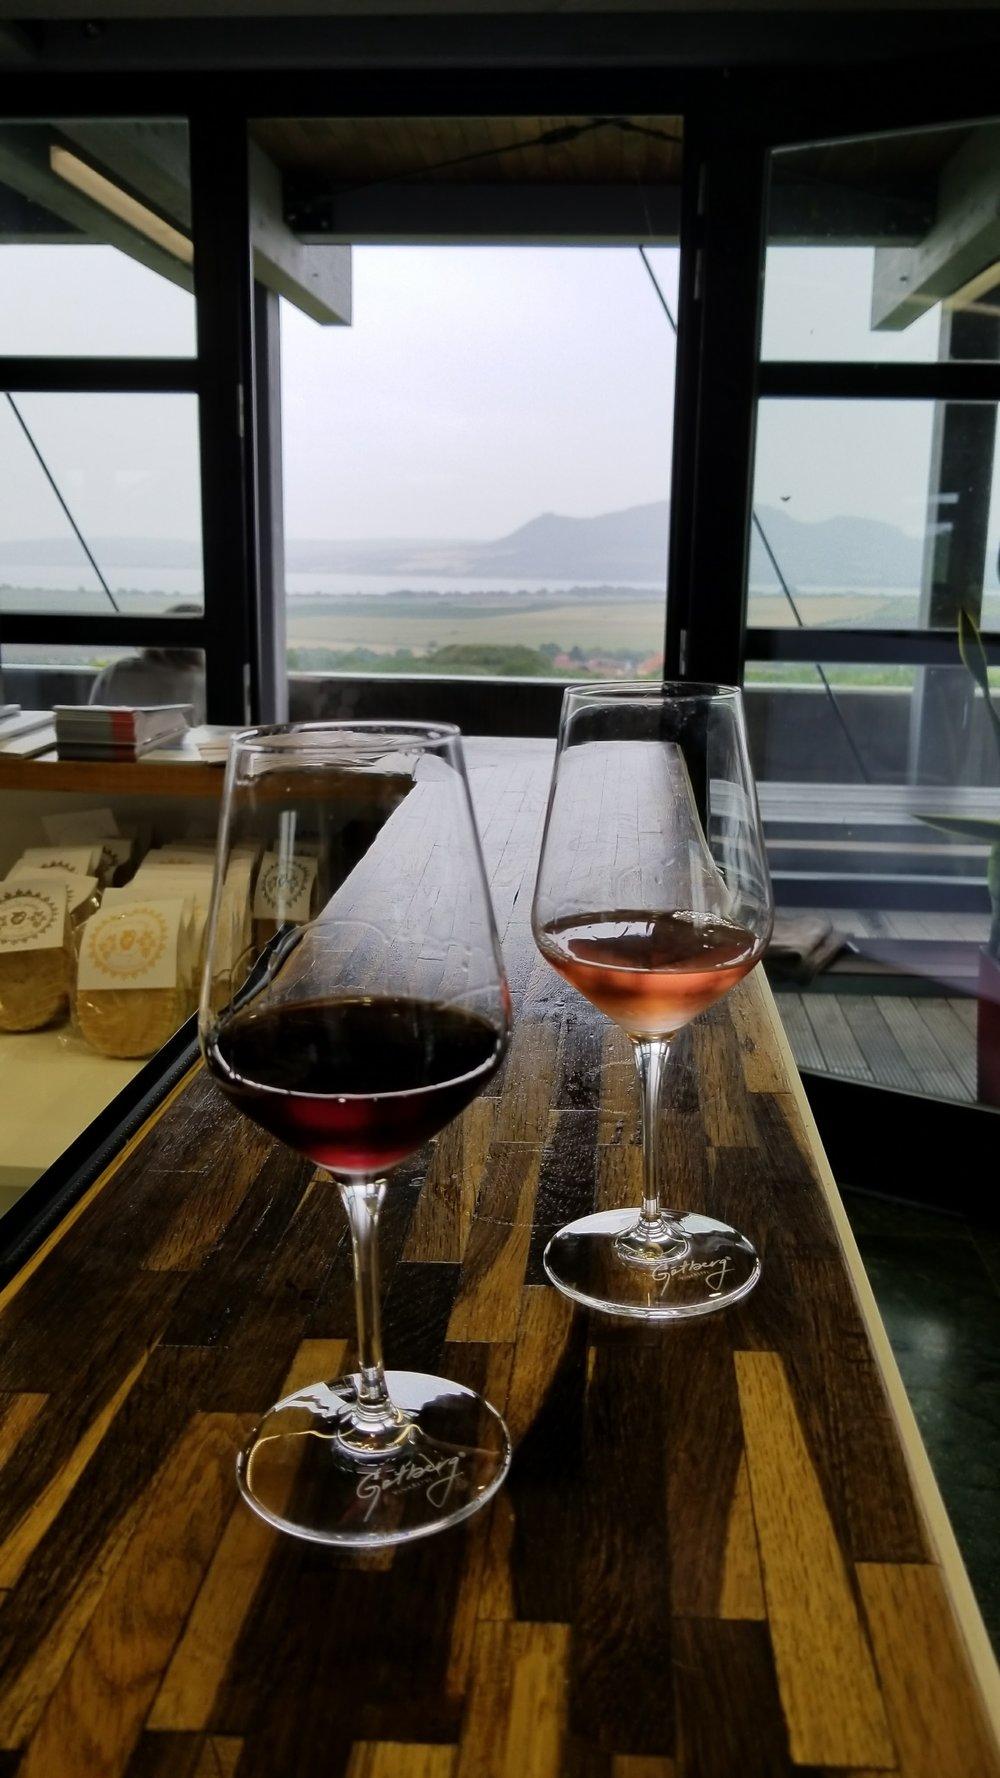 Wine tasting at Gotberg